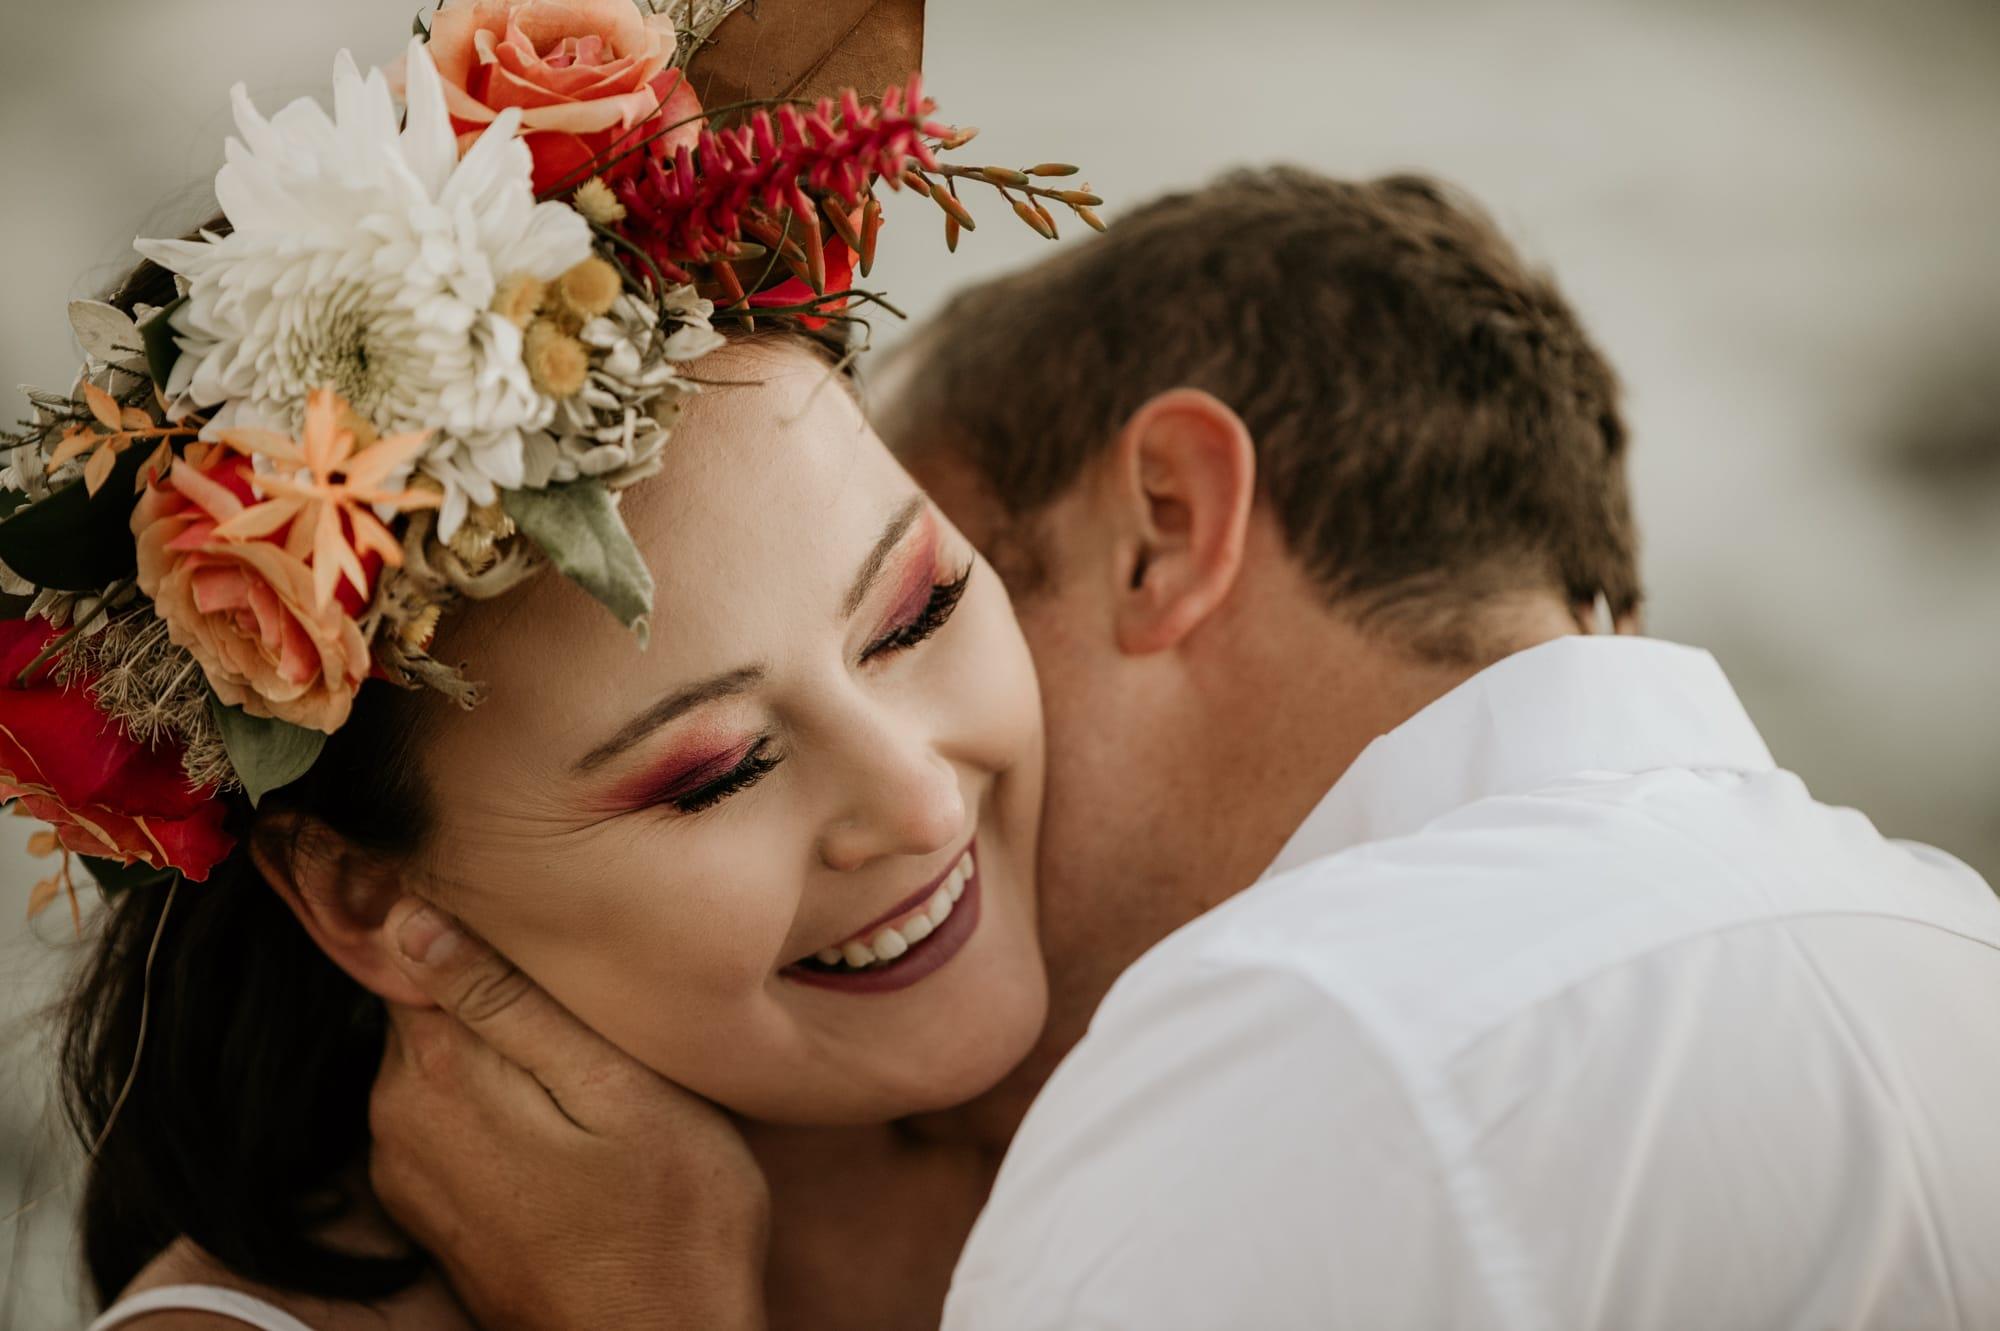 jesann-freddie-kranshoek-engagement-June-Richards-Photography-Destination-Weddings-Elopements-Garden-Route-18